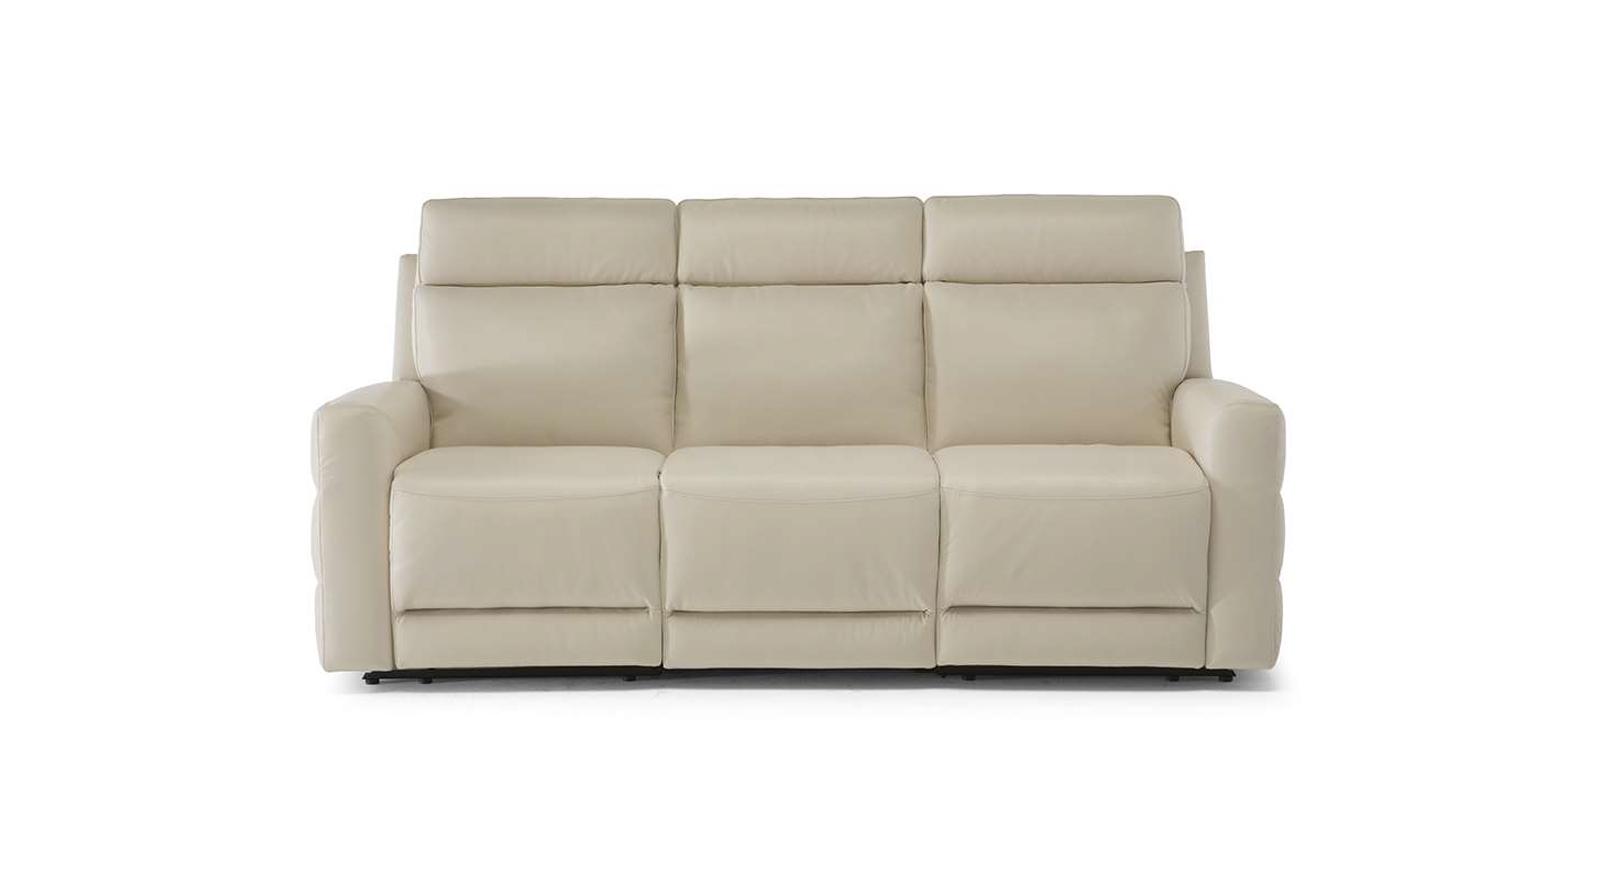 Natuzzi Editions Benevolo C121 Reclining Sofa Bracko Home with size 1600 X 886